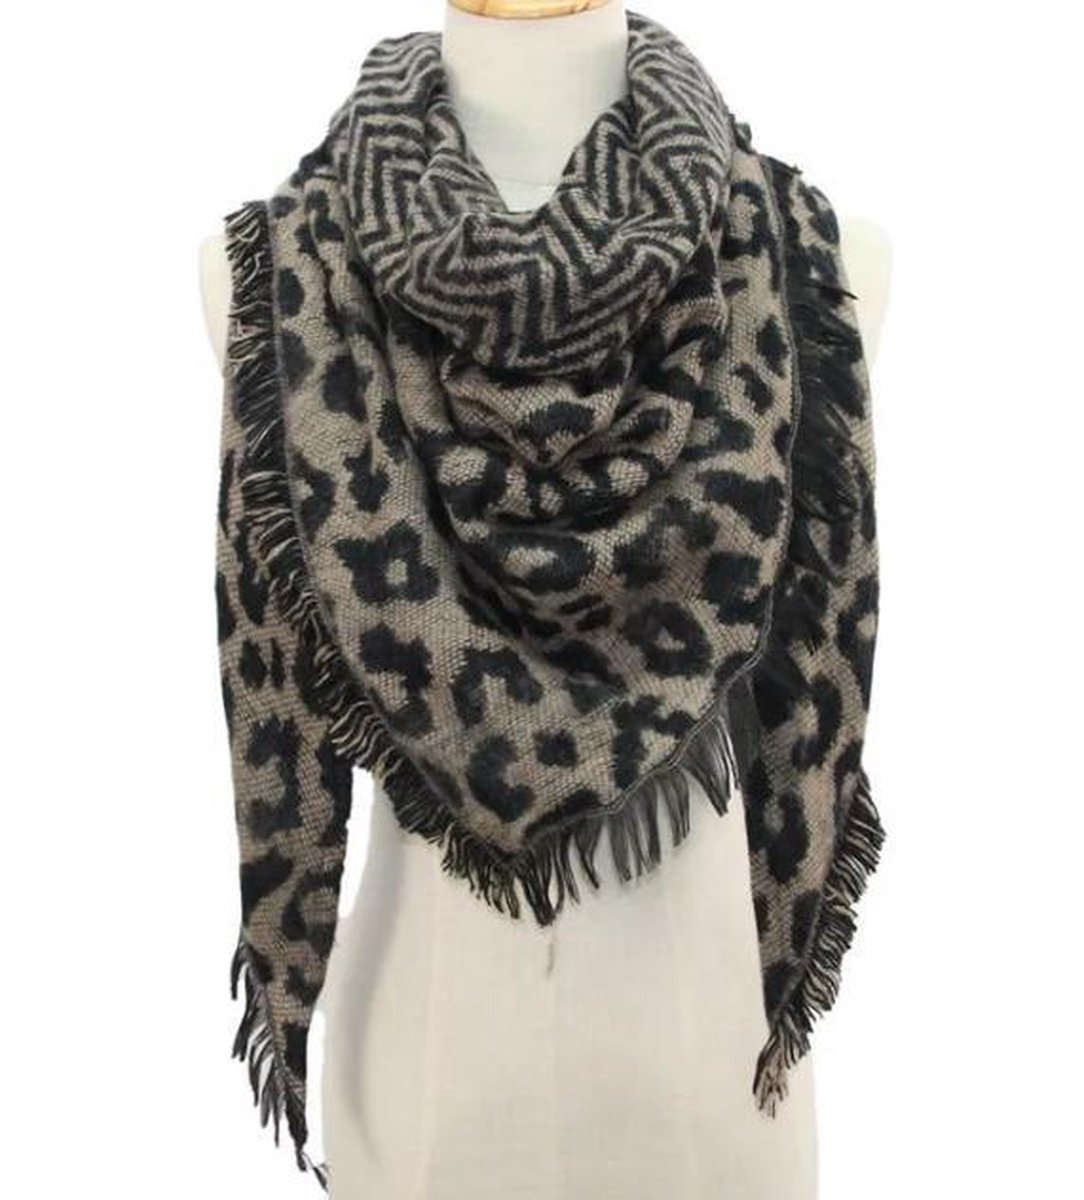 Warme winter luipaard print driehoekige dames sjaal camel zwart acryl circa 140 x 190 cm - Merkloos